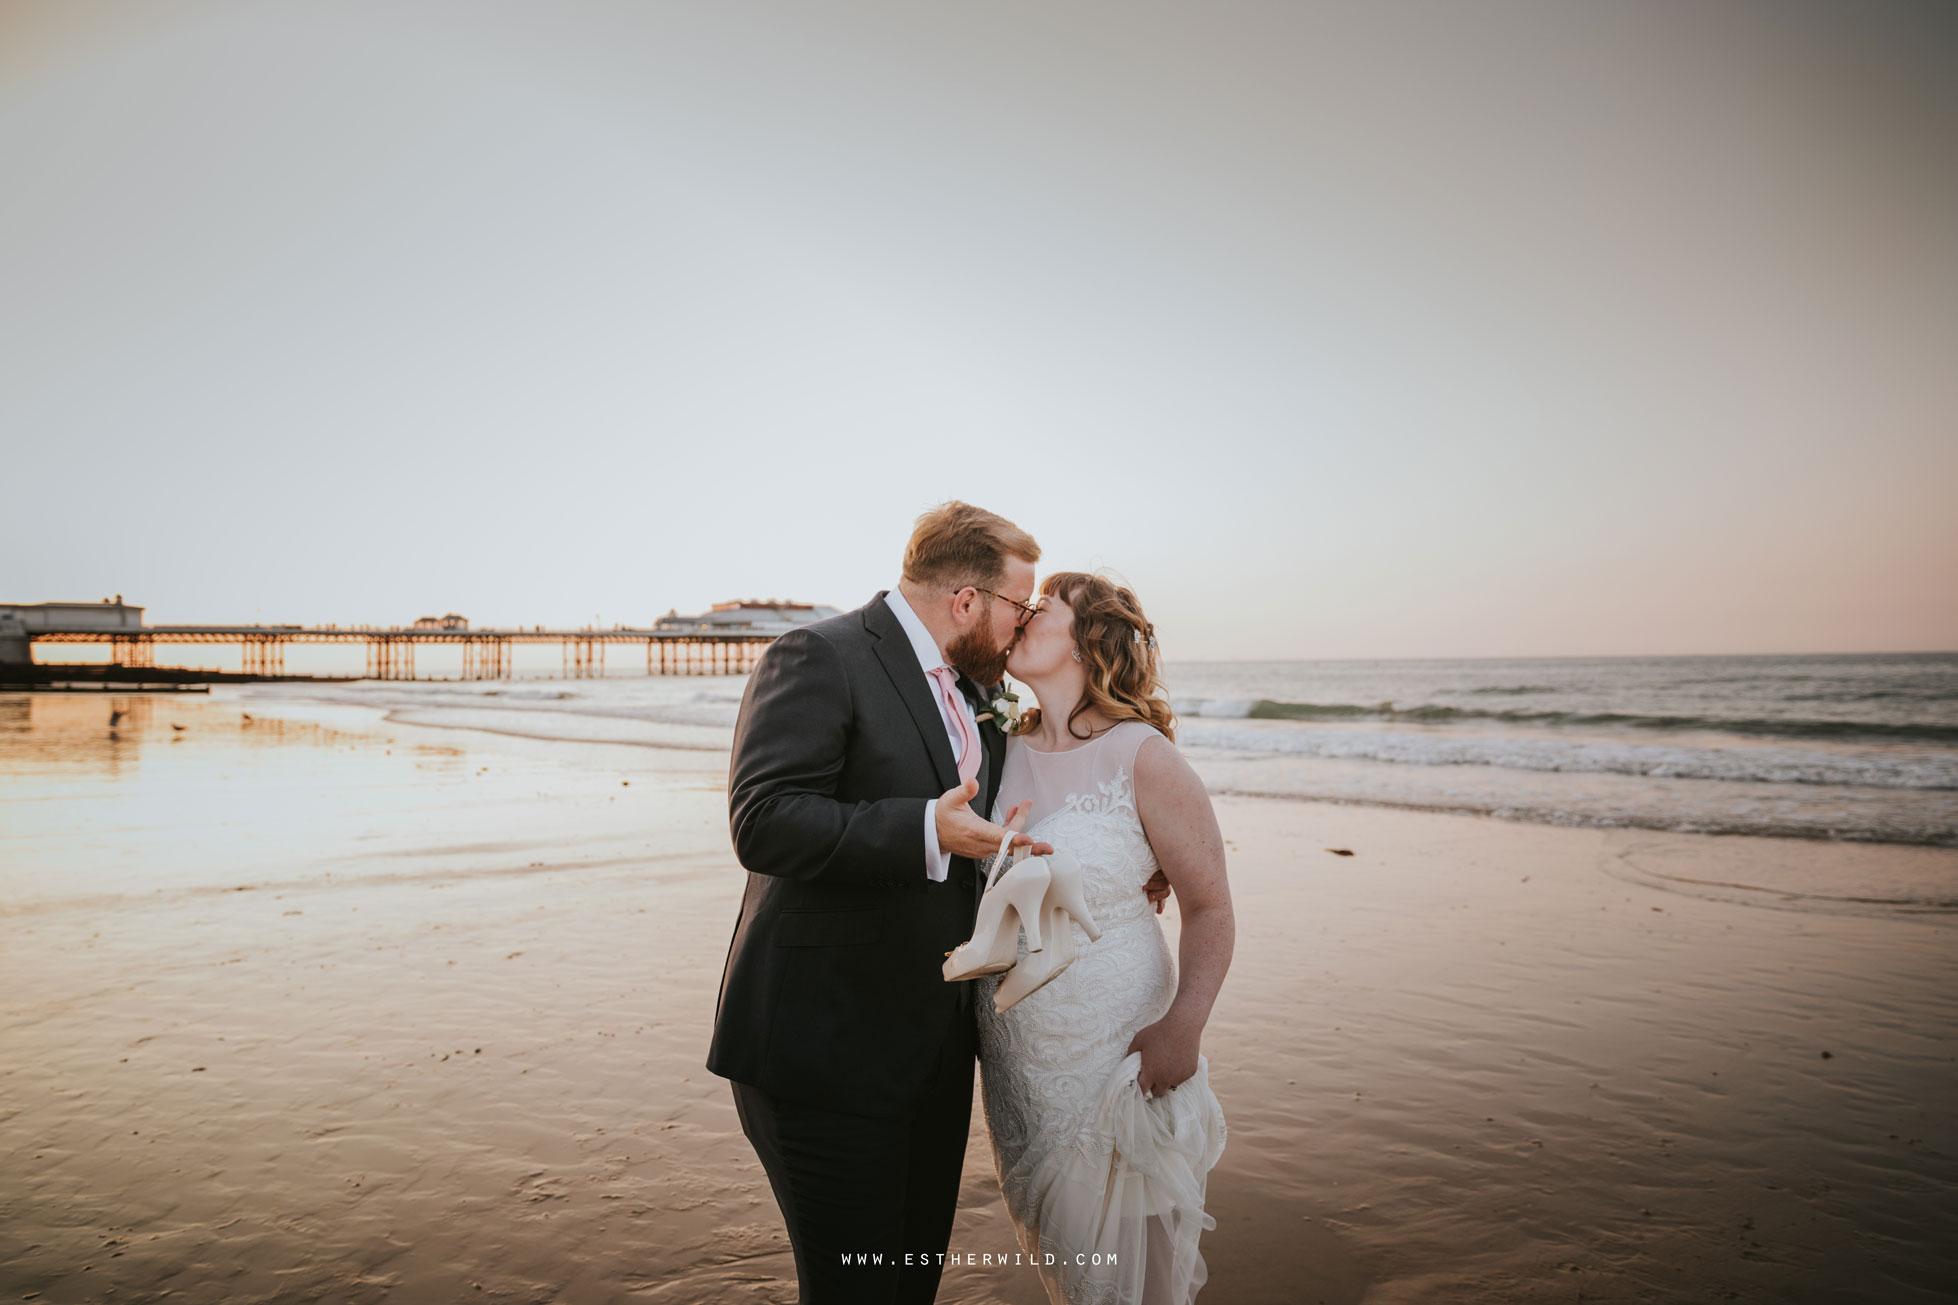 Cromer_Wedding_Beach_Outdoor_Ceremony_Norfolk_North_Lodge_Registry_Office_Rocket_House_Cafe_Cromer_Pier_IMG_5058.jpg